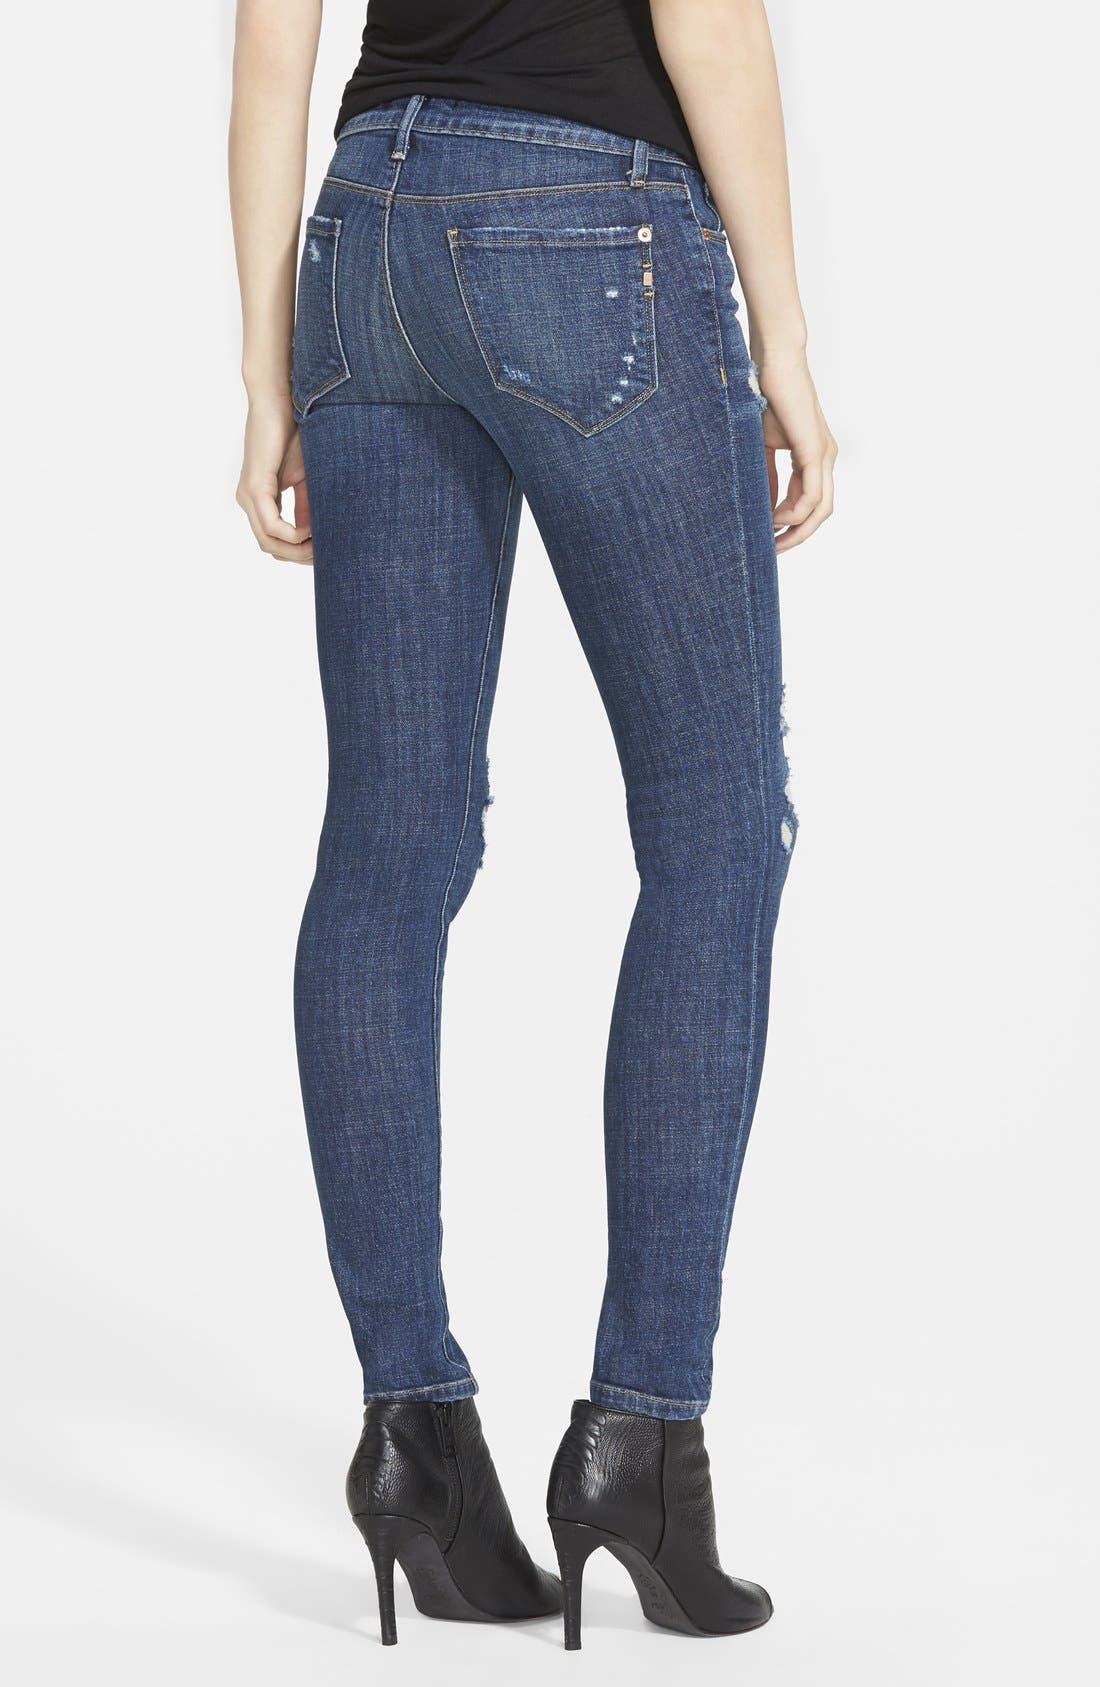 GENETIC, 'Shya' Skinny Jeans, Alternate thumbnail 2, color, 421